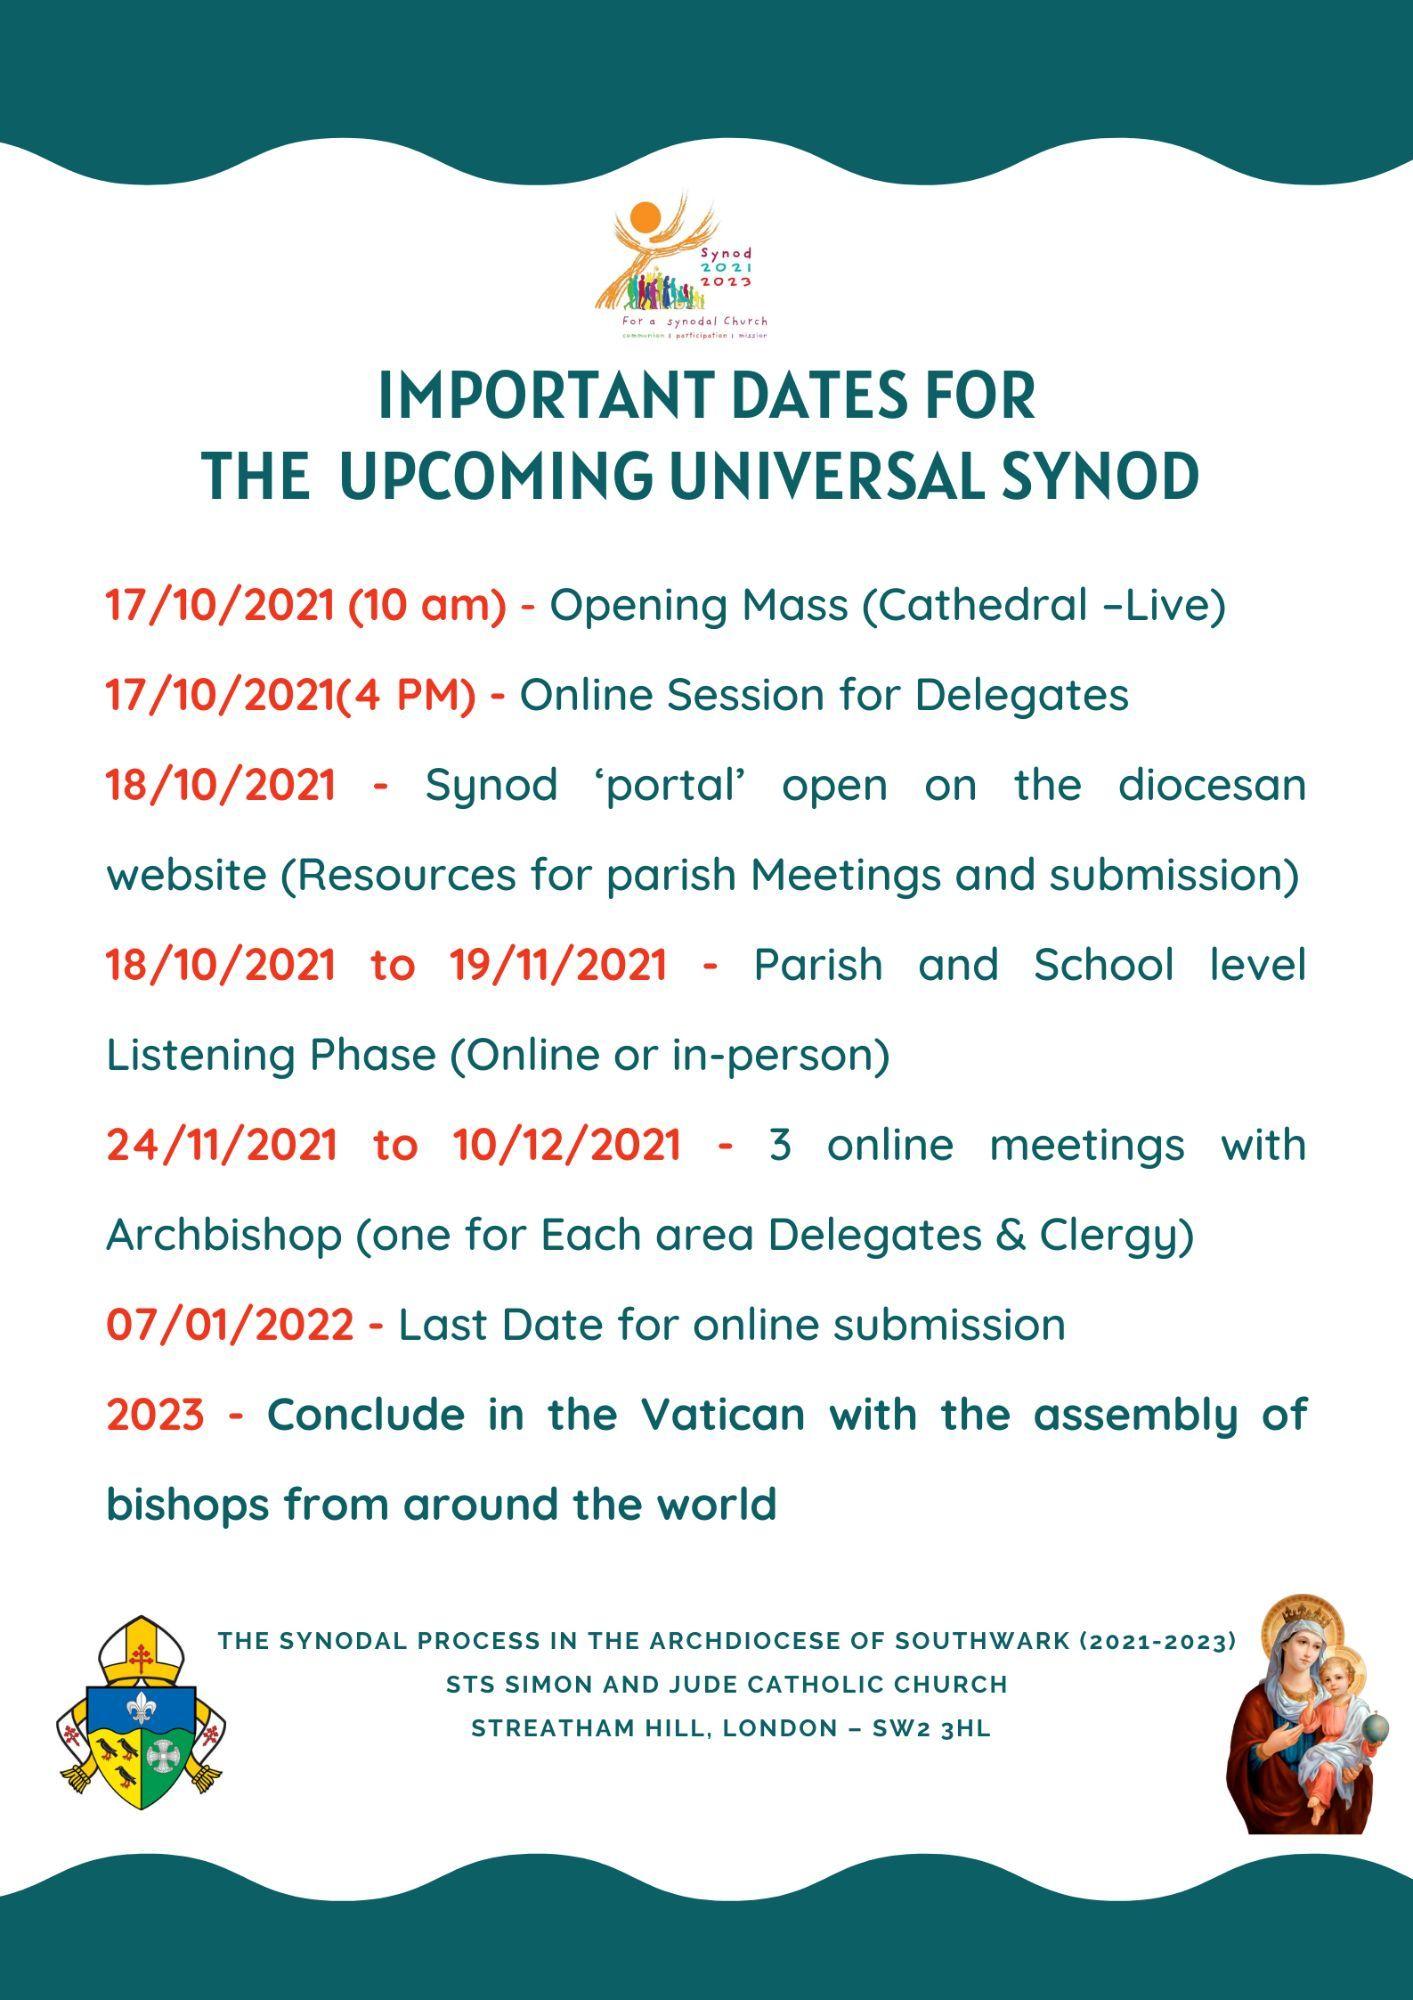 Important Dates for the Upcoming Universal Synod  (Adsumus, Sancte Spiritus)